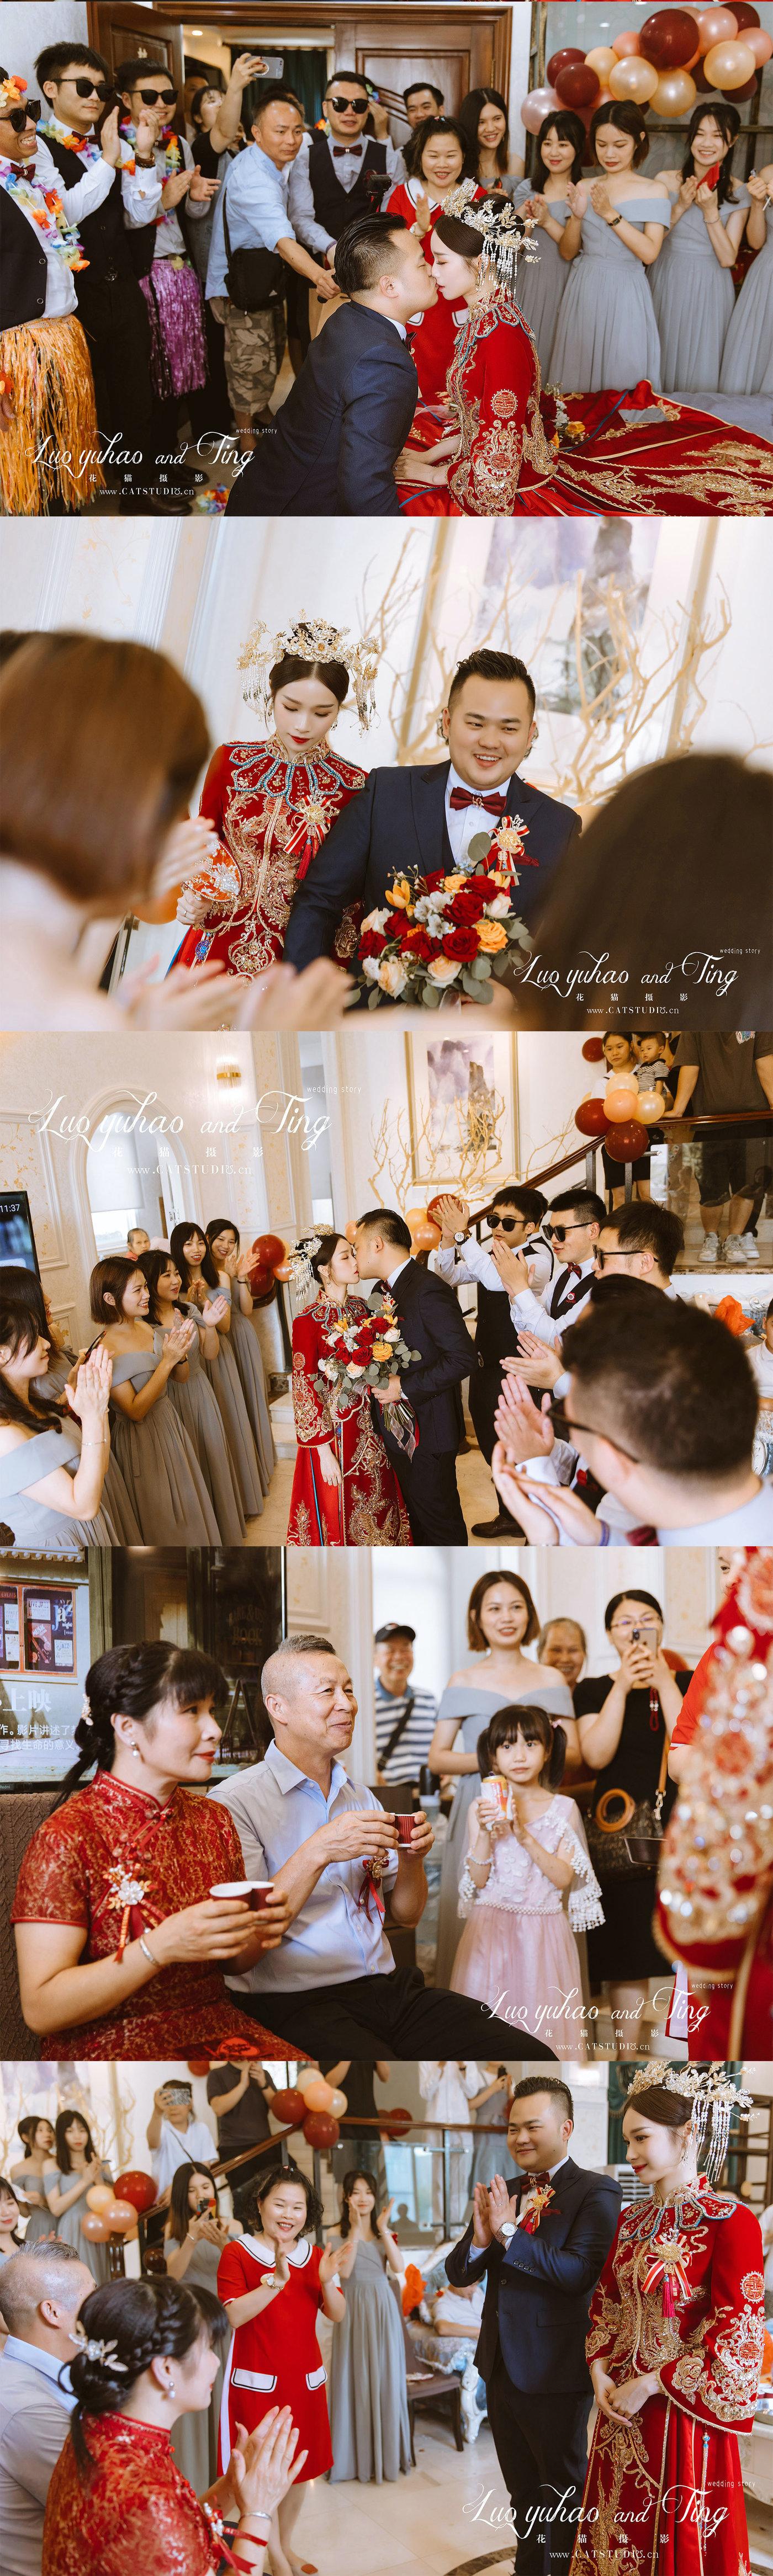 wedding day-ting(总监作品)9